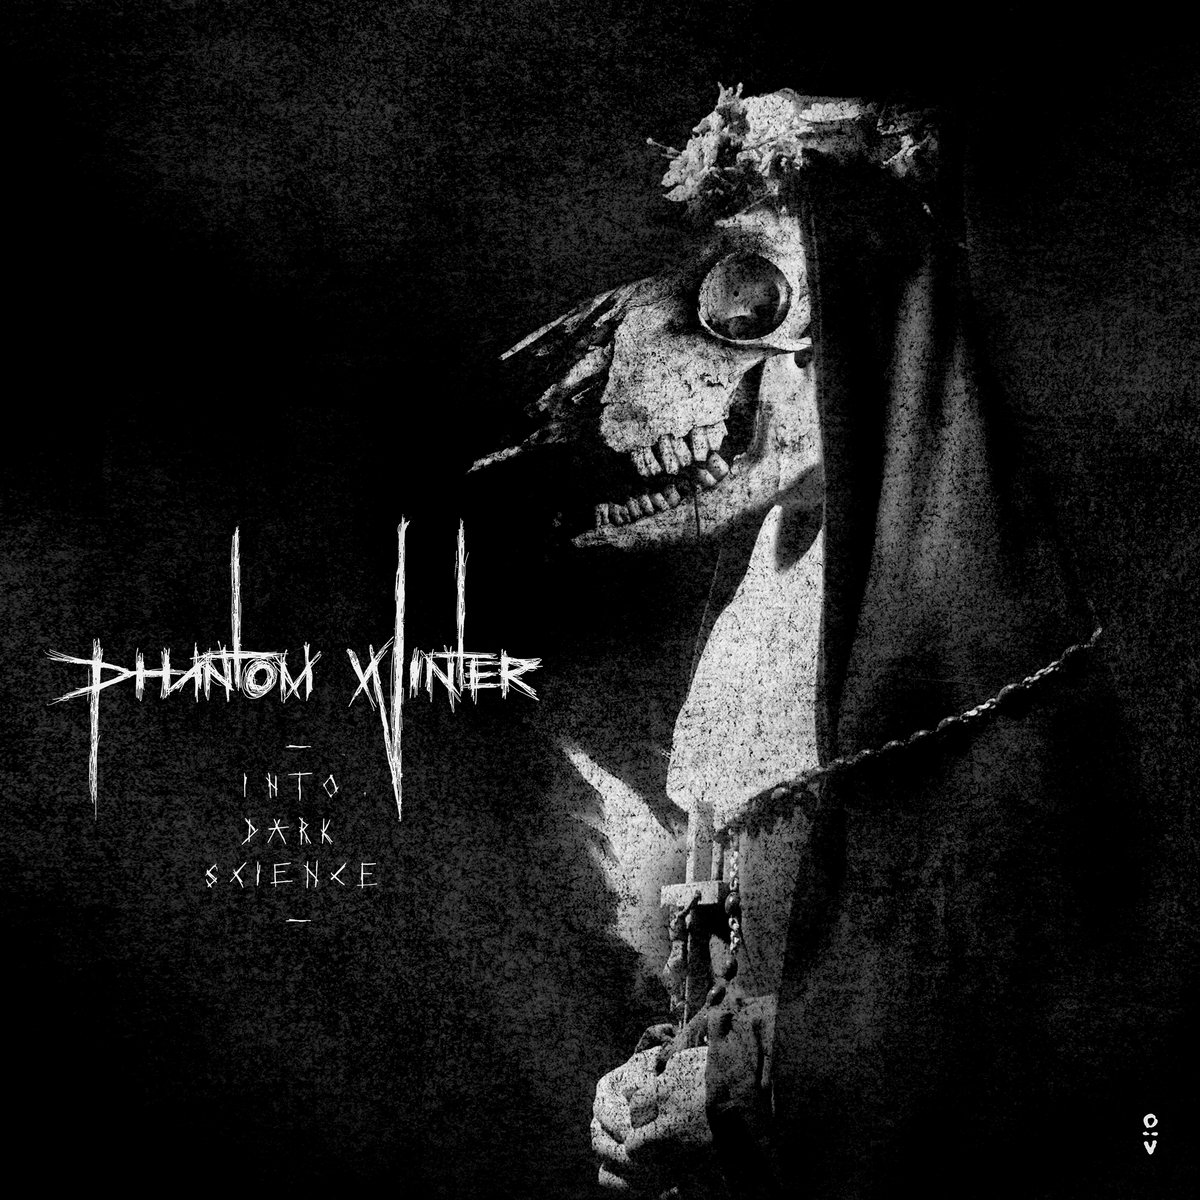 Phantom Winter - Into Dark Science LP